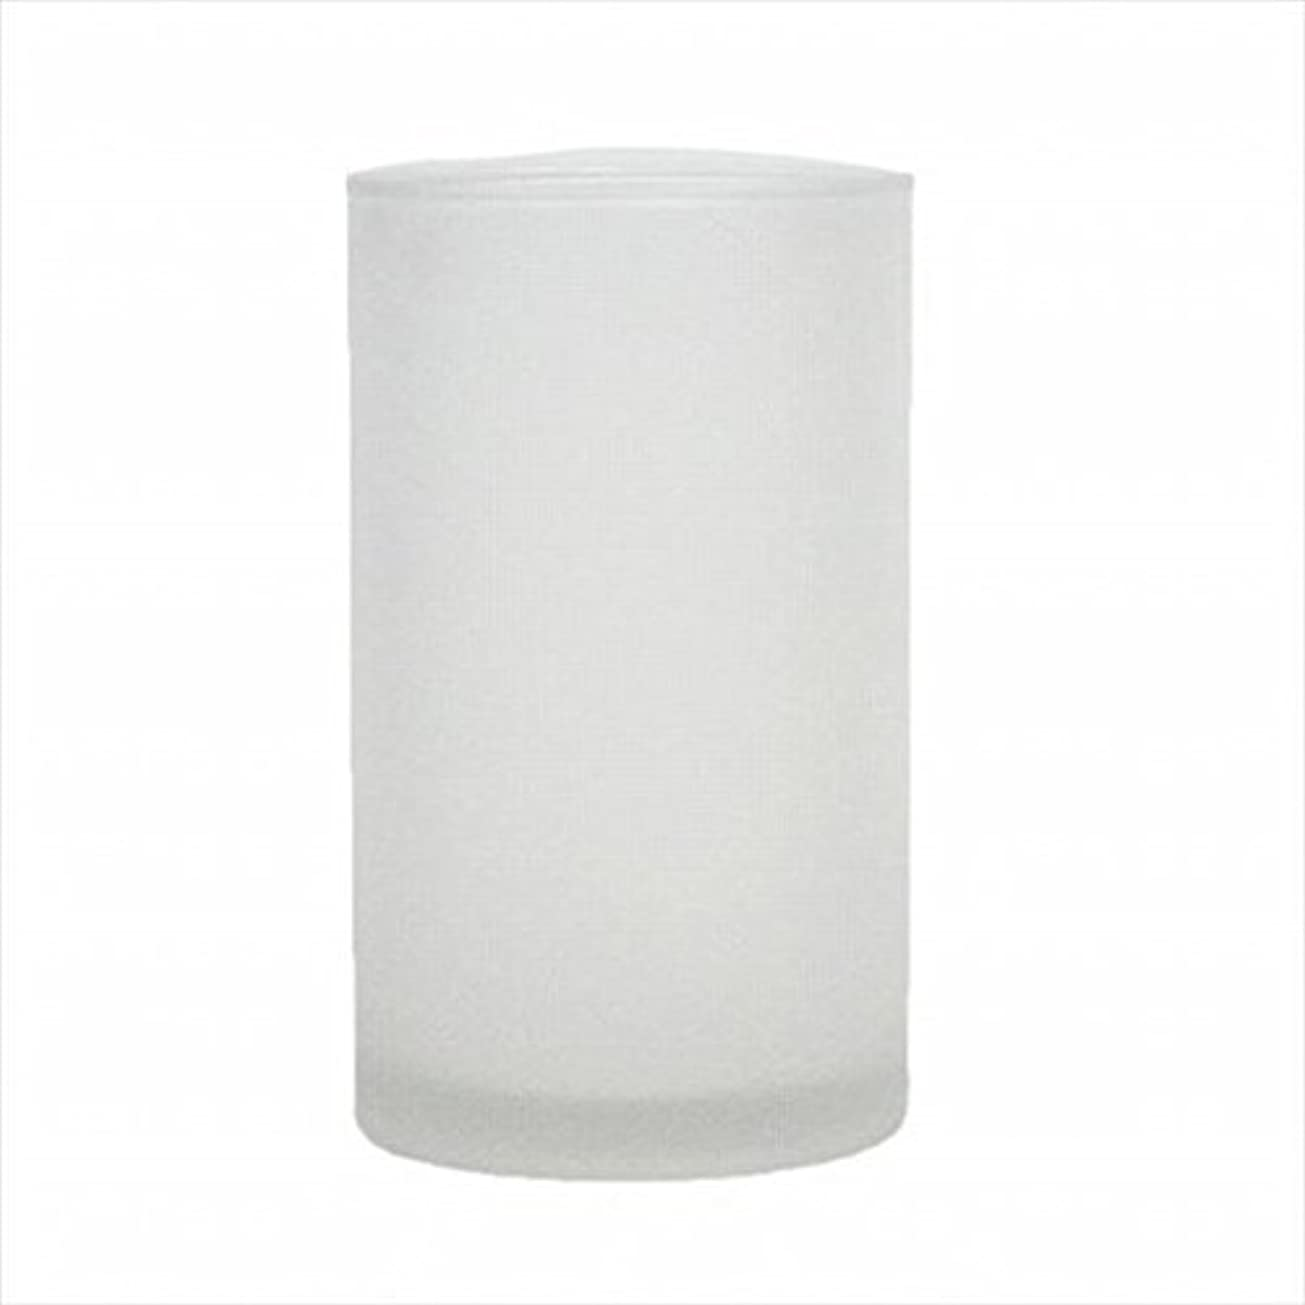 kameyama candle(カメヤマキャンドル) モルカグラスSフロスト キャンドル 90x90x155mm (65980000)